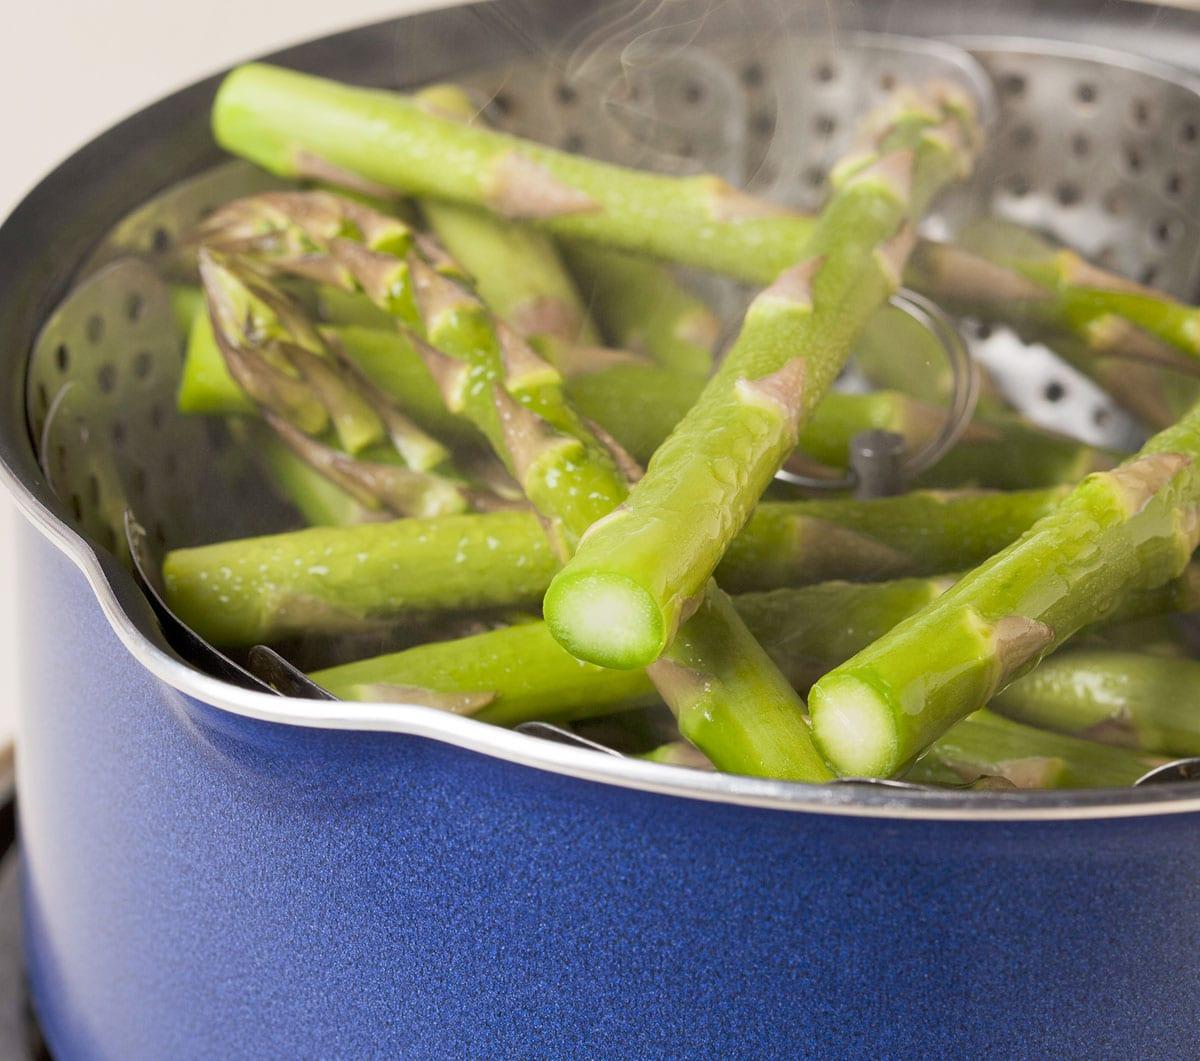 Blanching asparagus steaming method